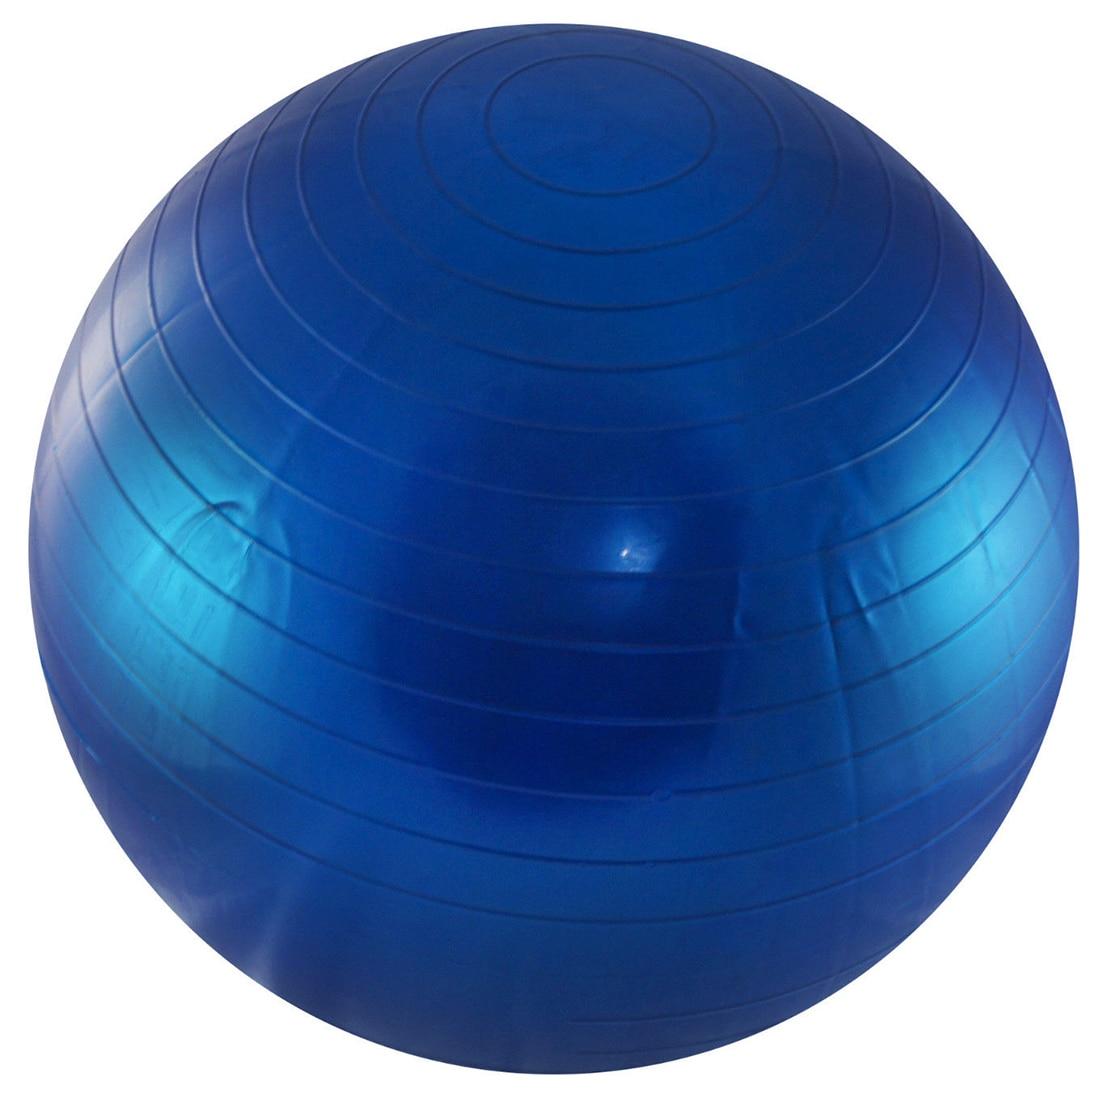 Balancing Stability Ball for Yoga Pilates Anti-Burst + Air Pump